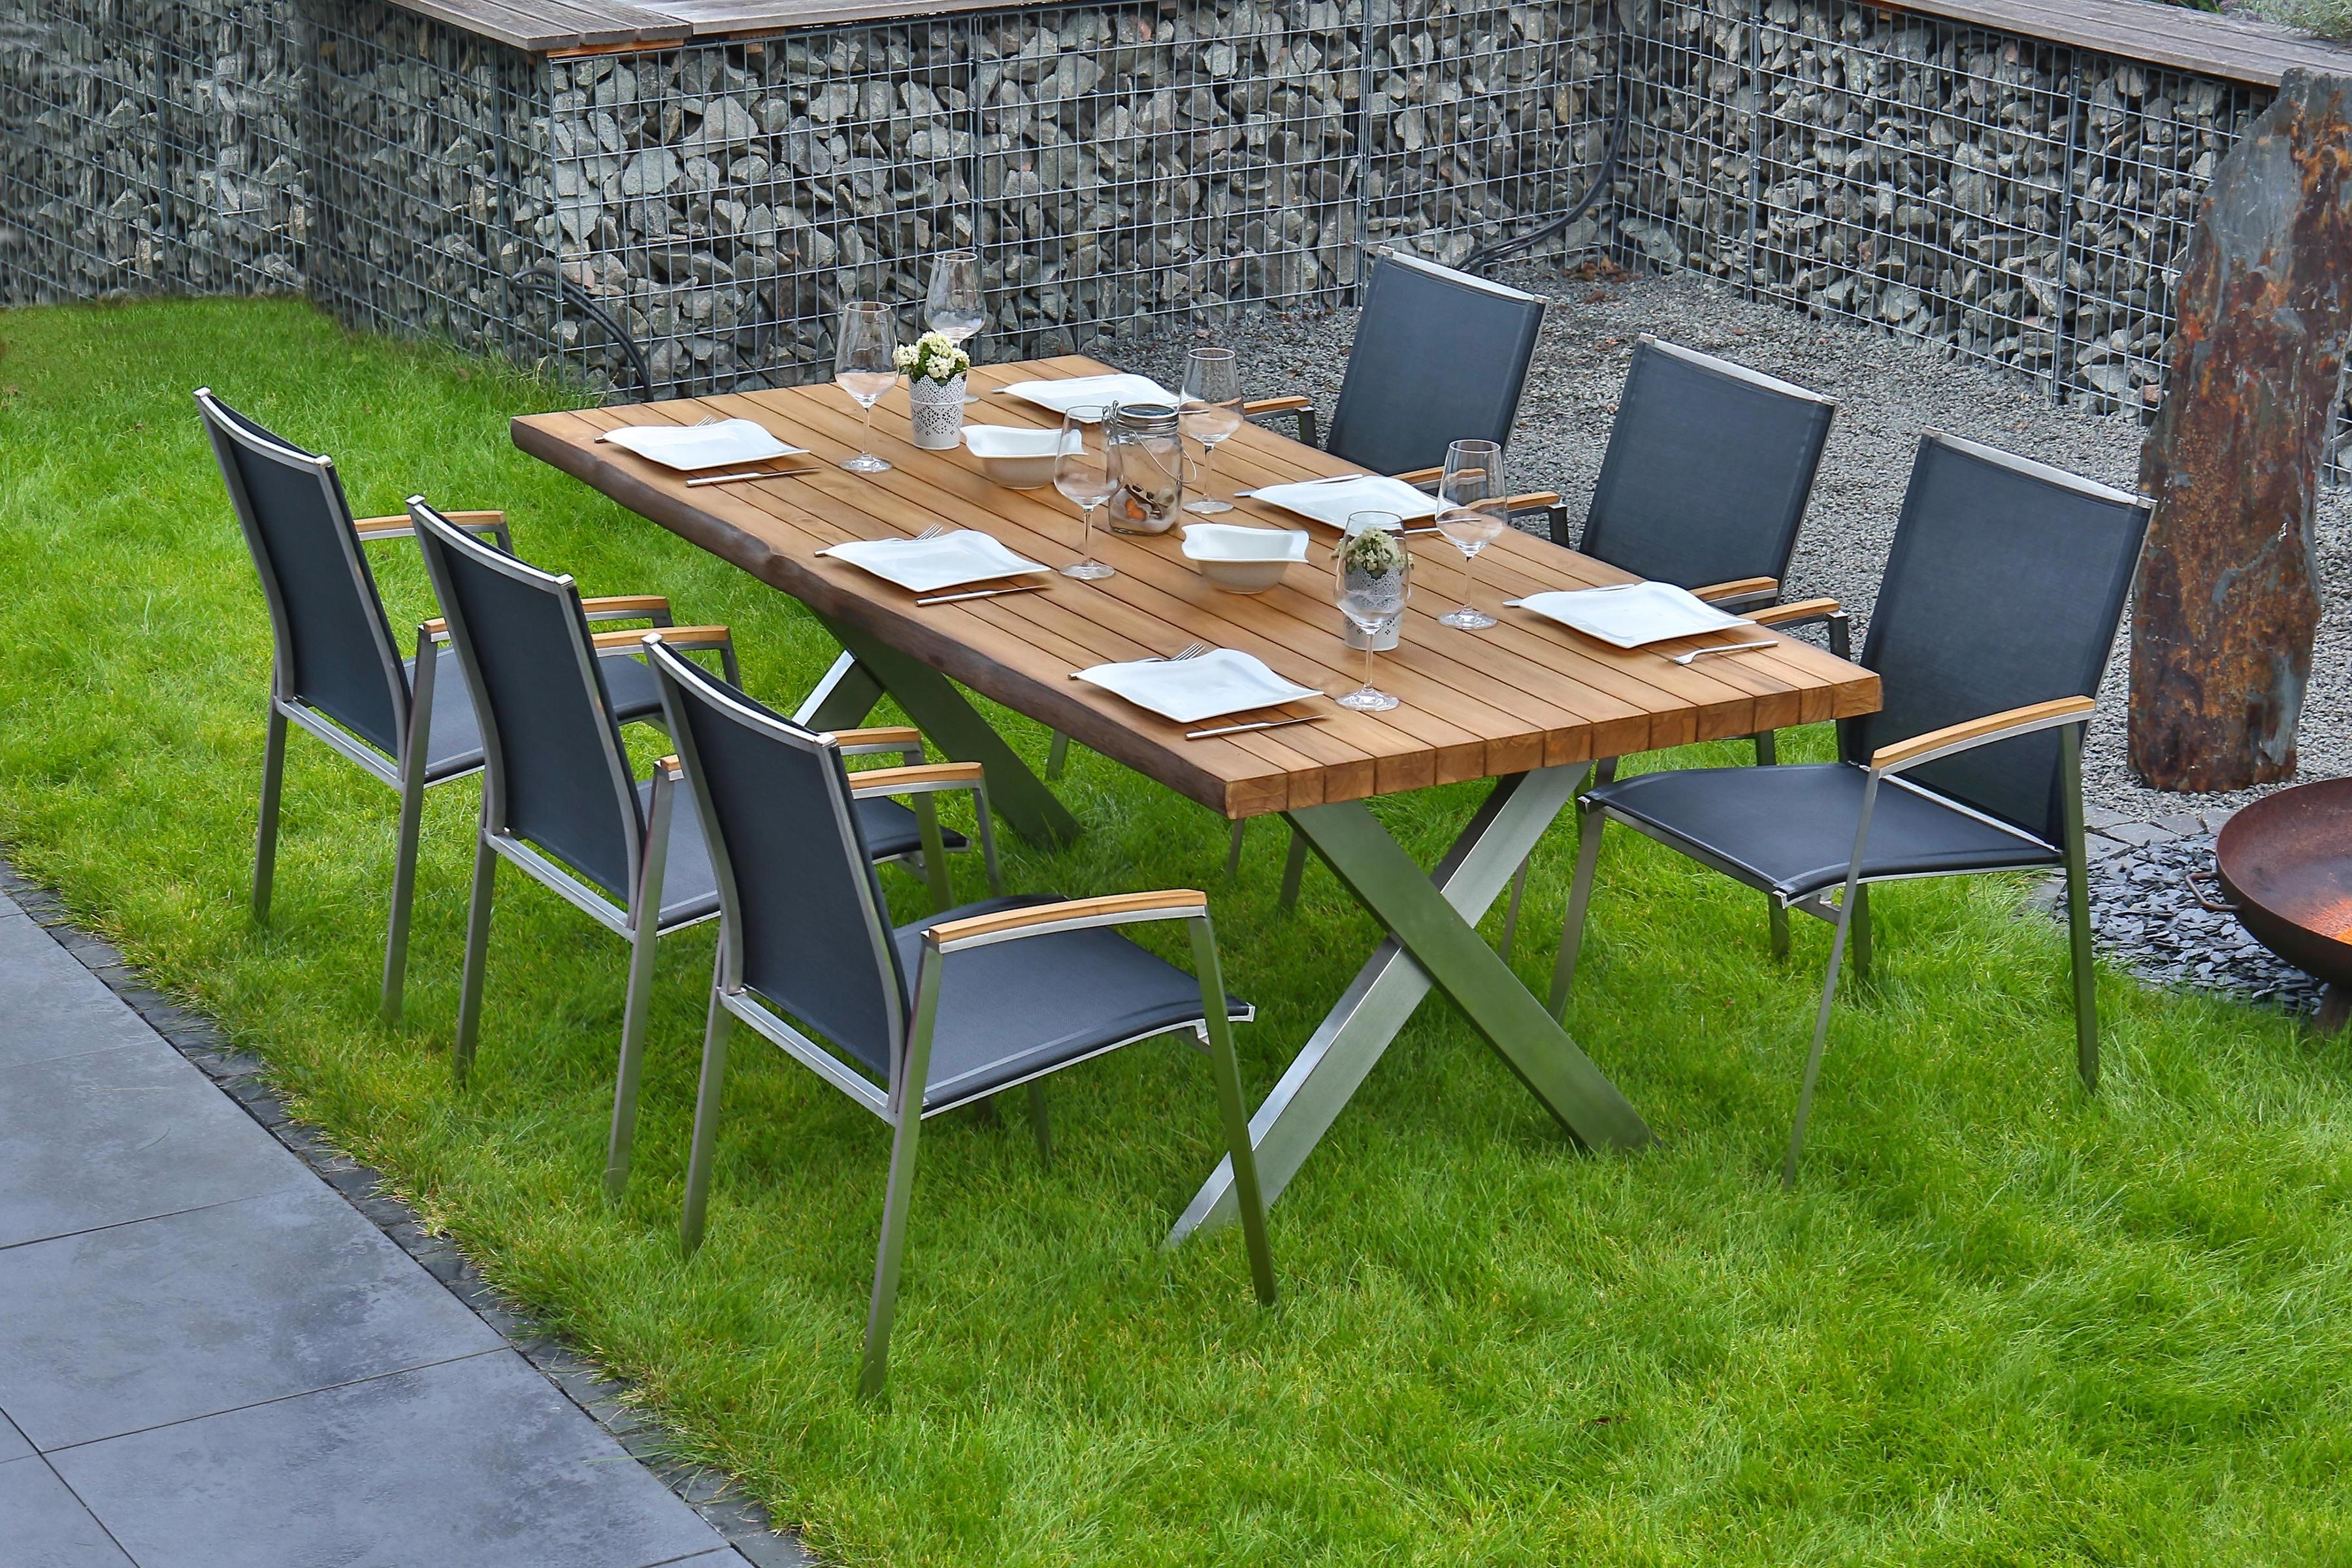 BELLASOLE Gartenmöbelset 7-tlg 6 Stühle Tisch 200x100 cm Teakholz